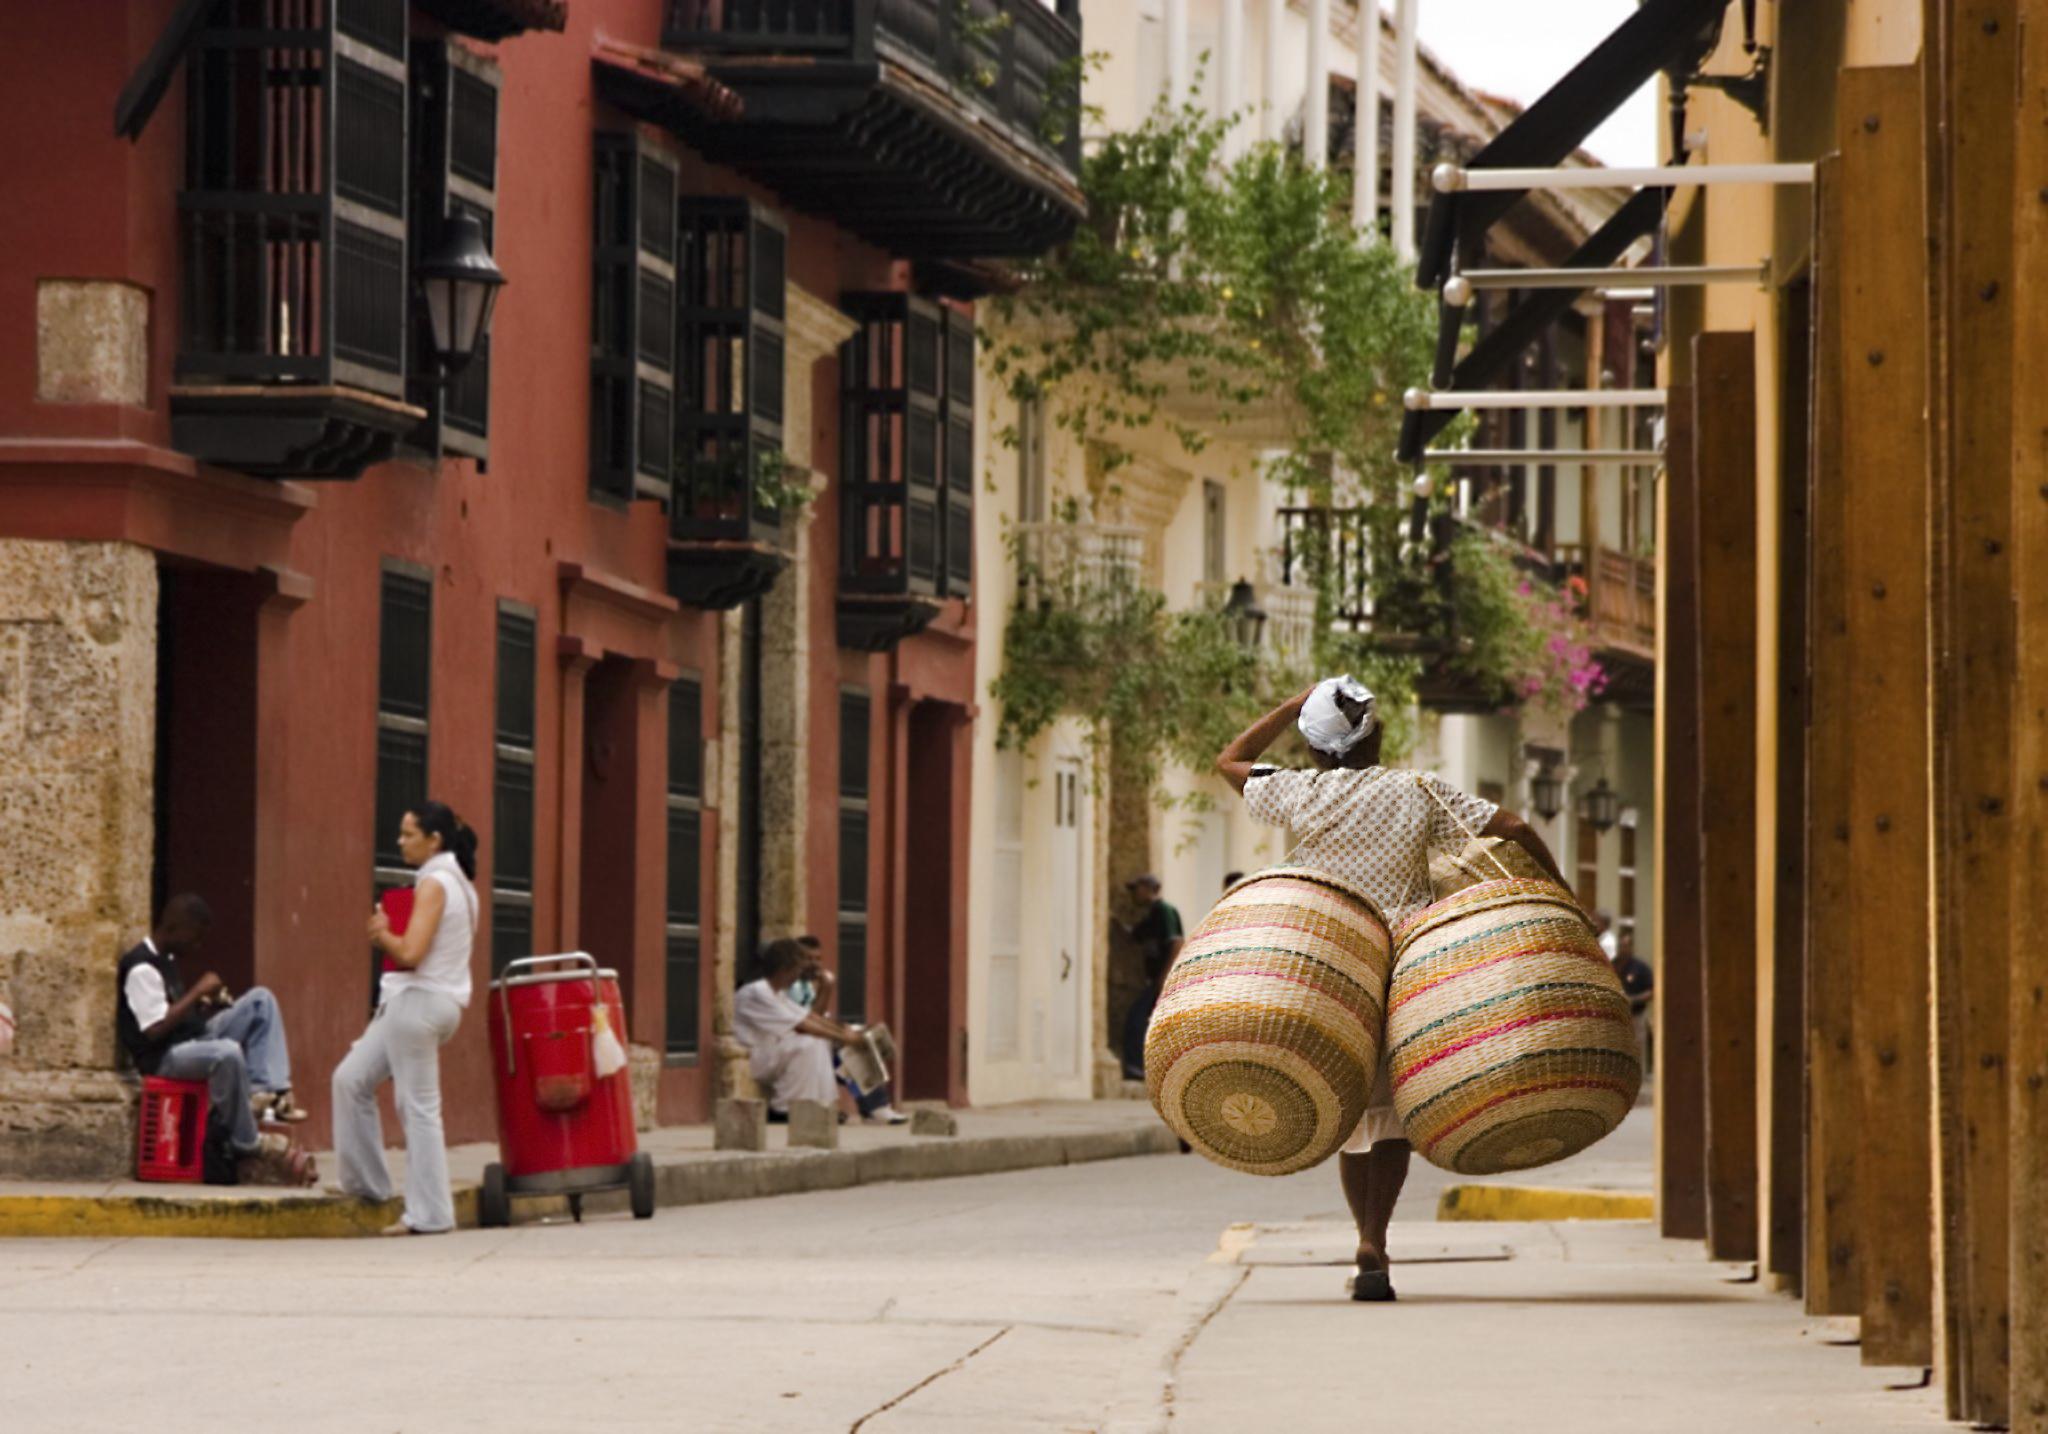 The Best of Colombia med landsbyer, storbyer og naturparadis. Besøk Bogotá og Cartagena og kulturelle skatter med fantastiske naturperler, blant annet Tayrona National Park.